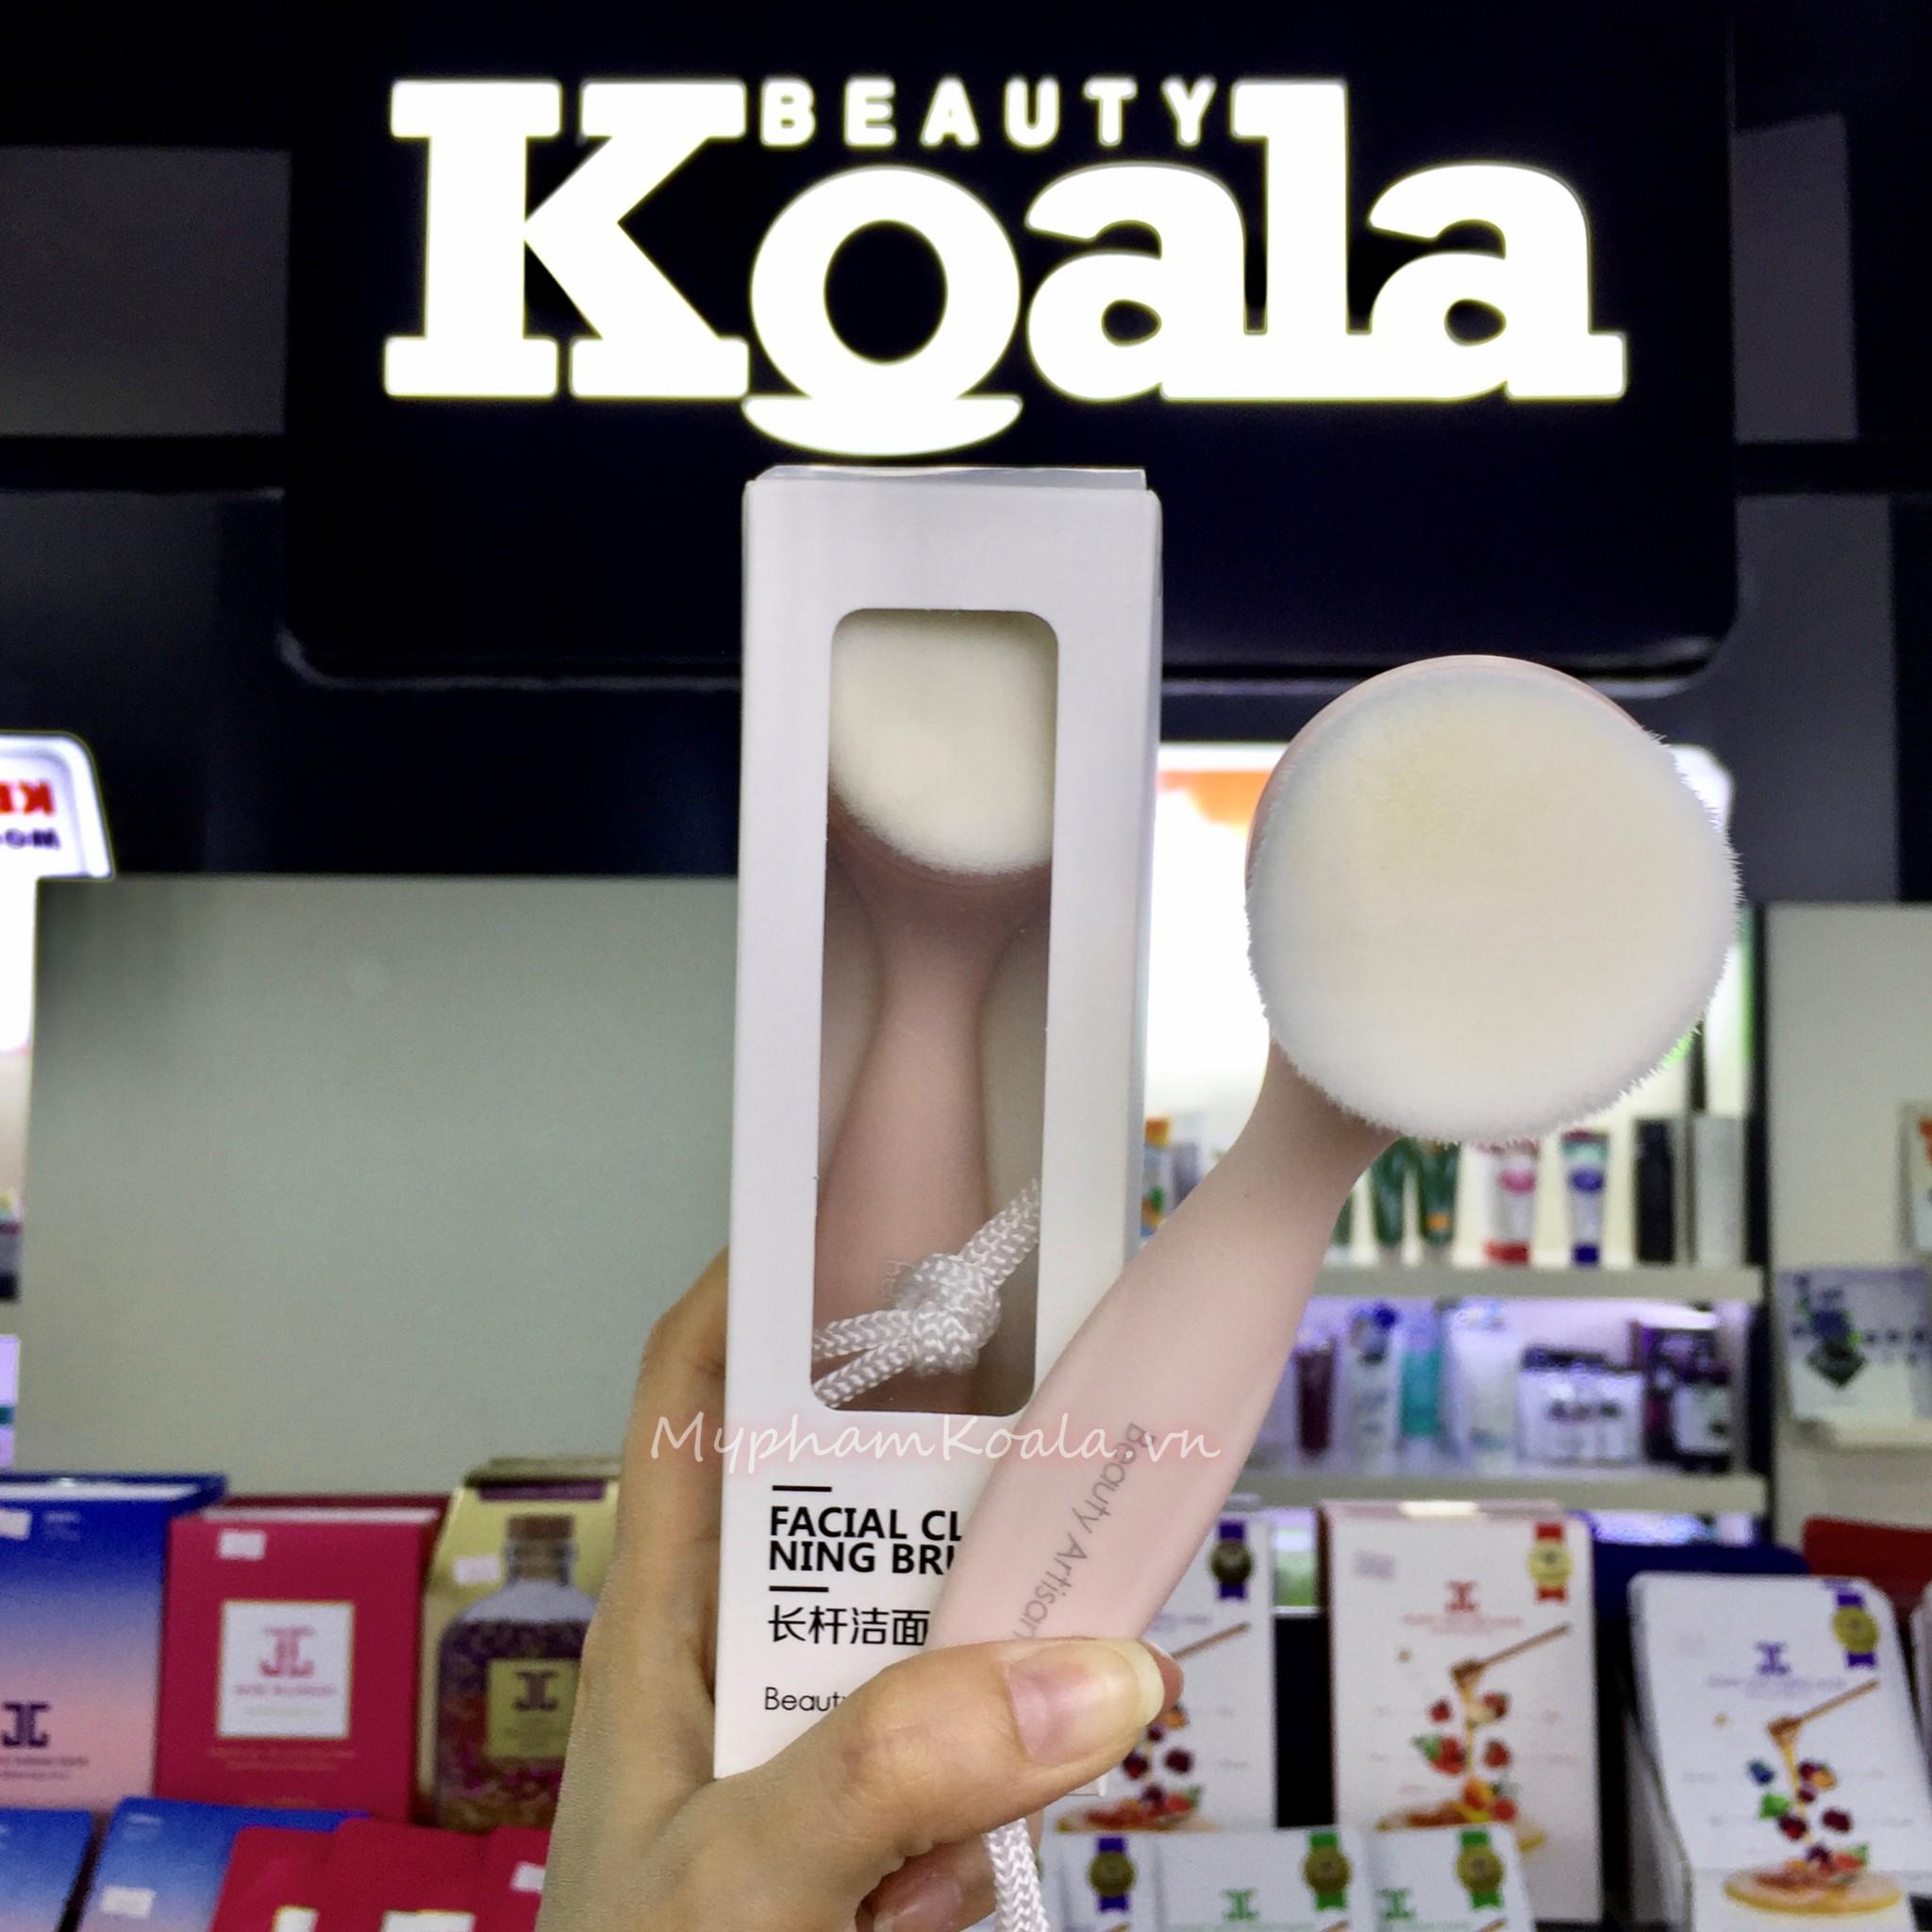 Cọ Rửa Mặt Cao Cấp Beauty Artis Facial Cleansing Brush